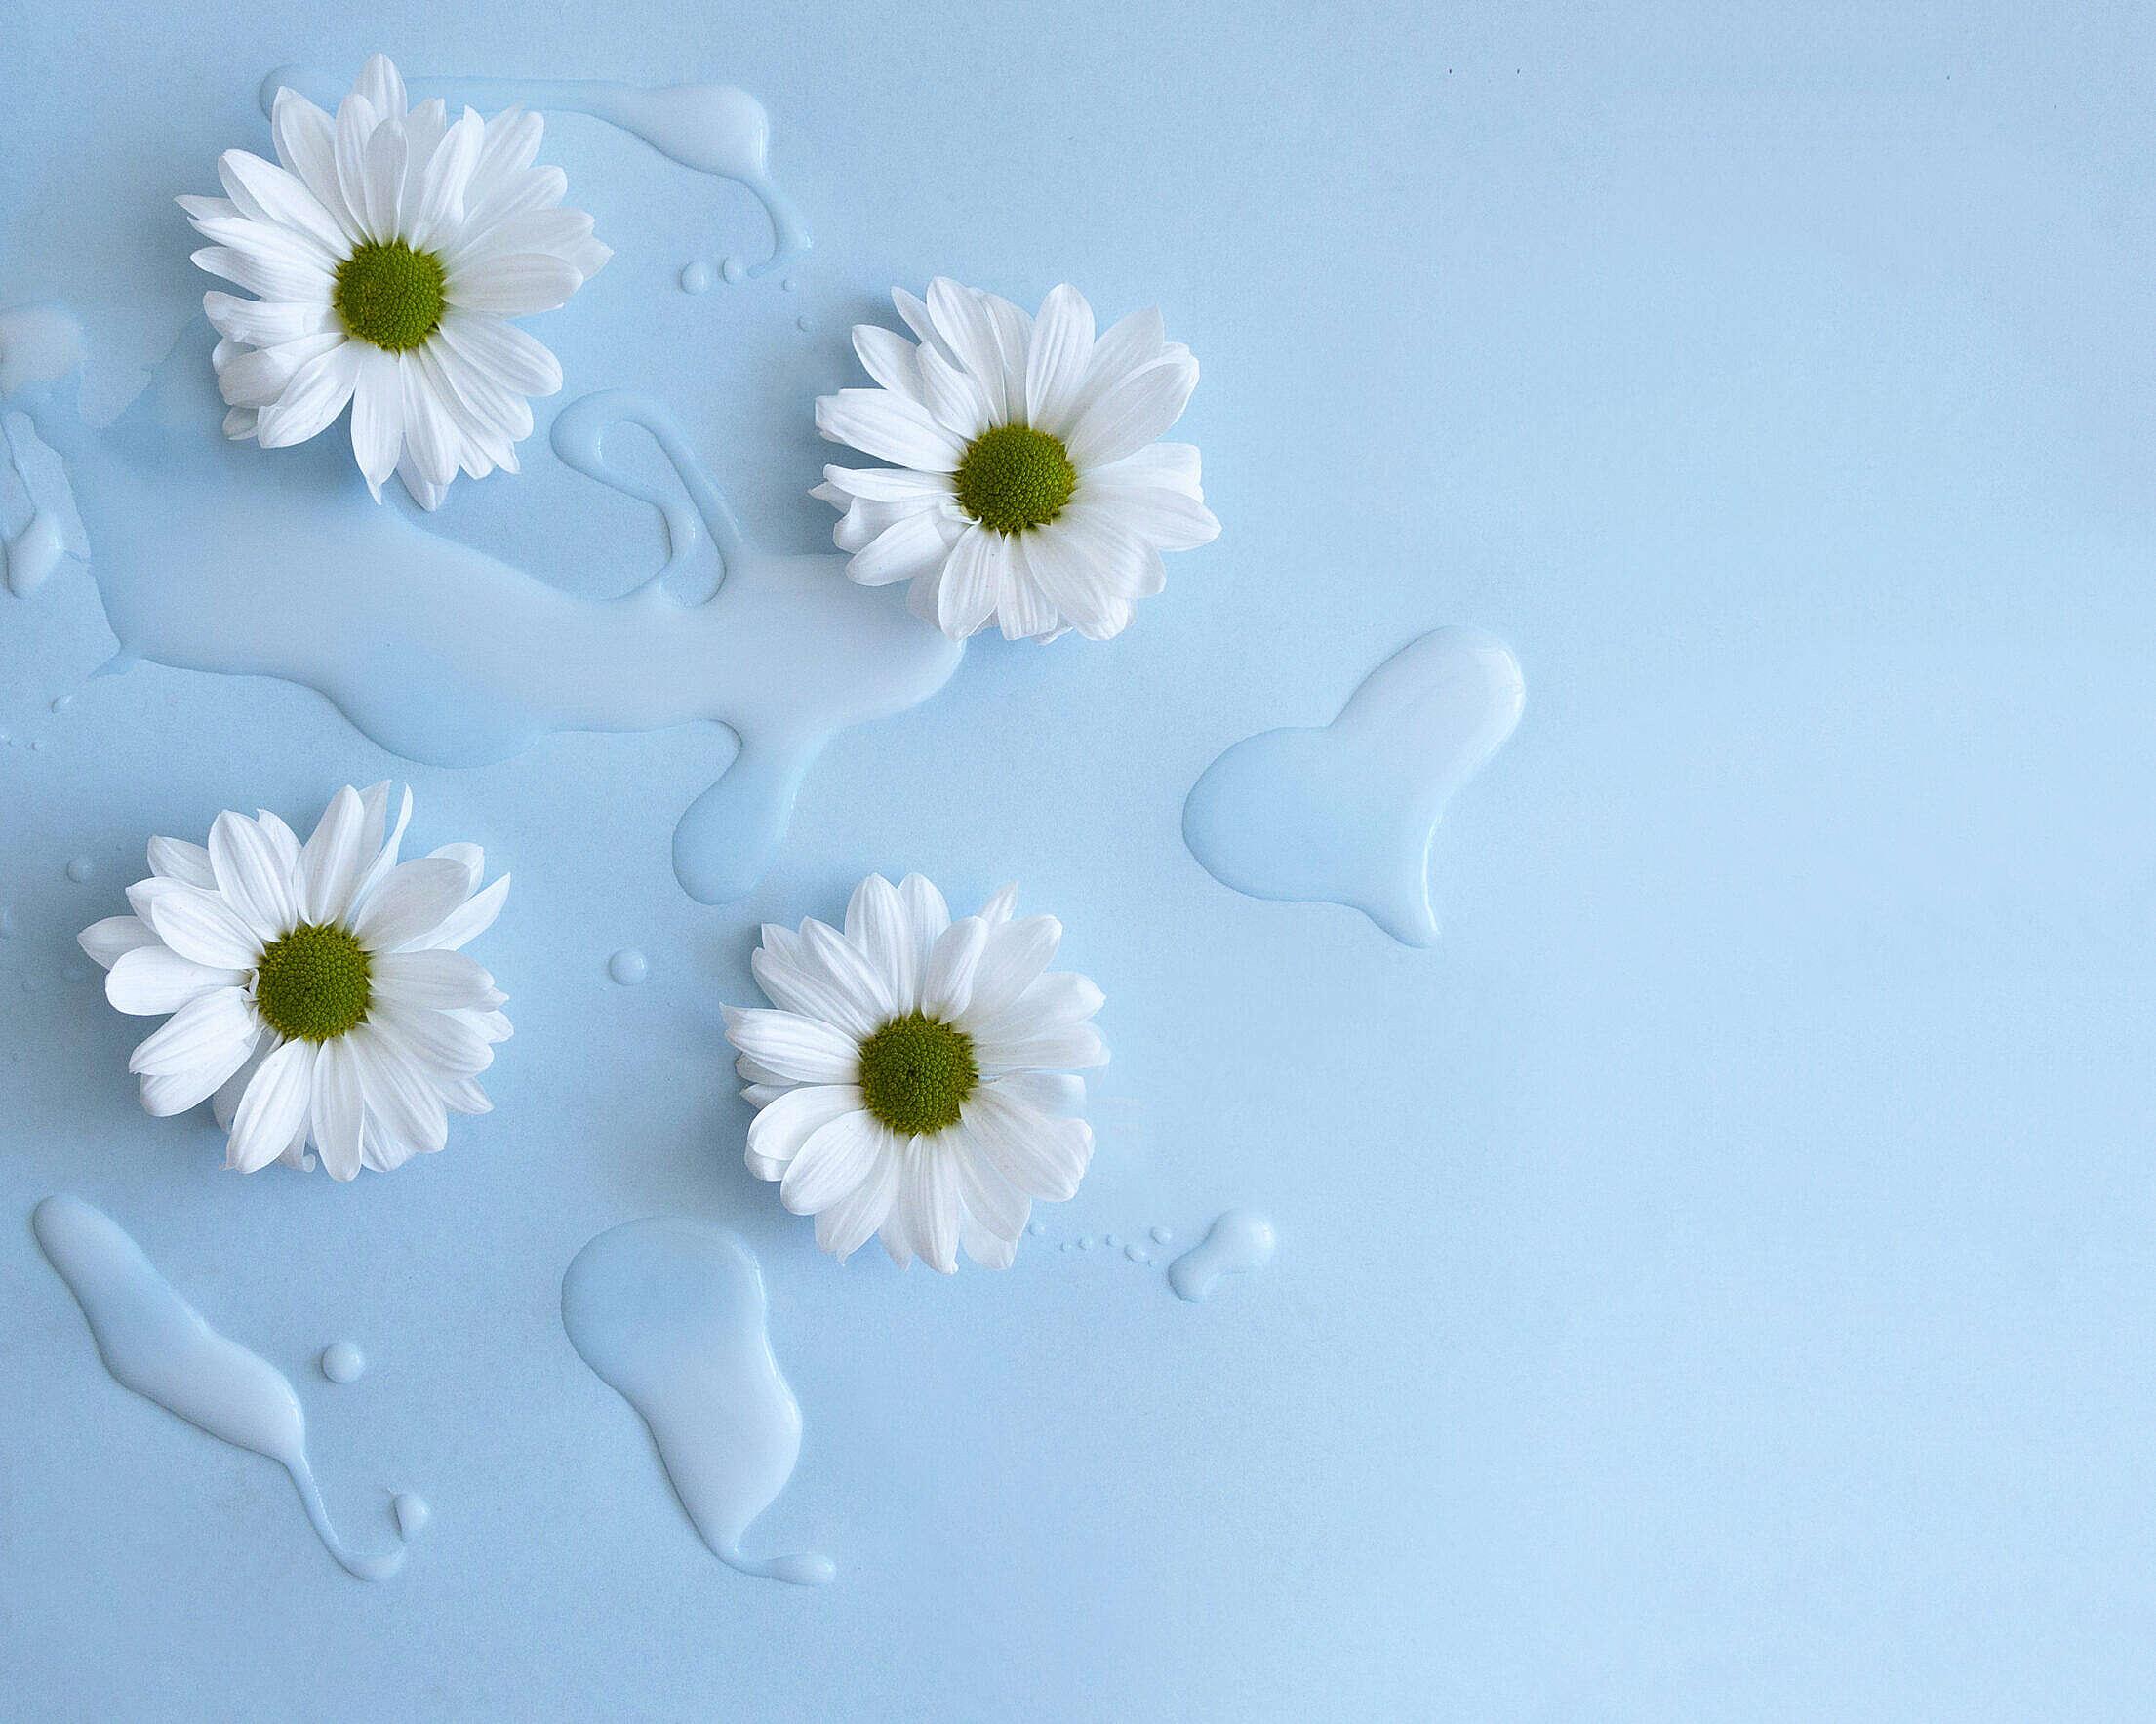 Fresh White Flowers on Blue Background Free Stock Photo